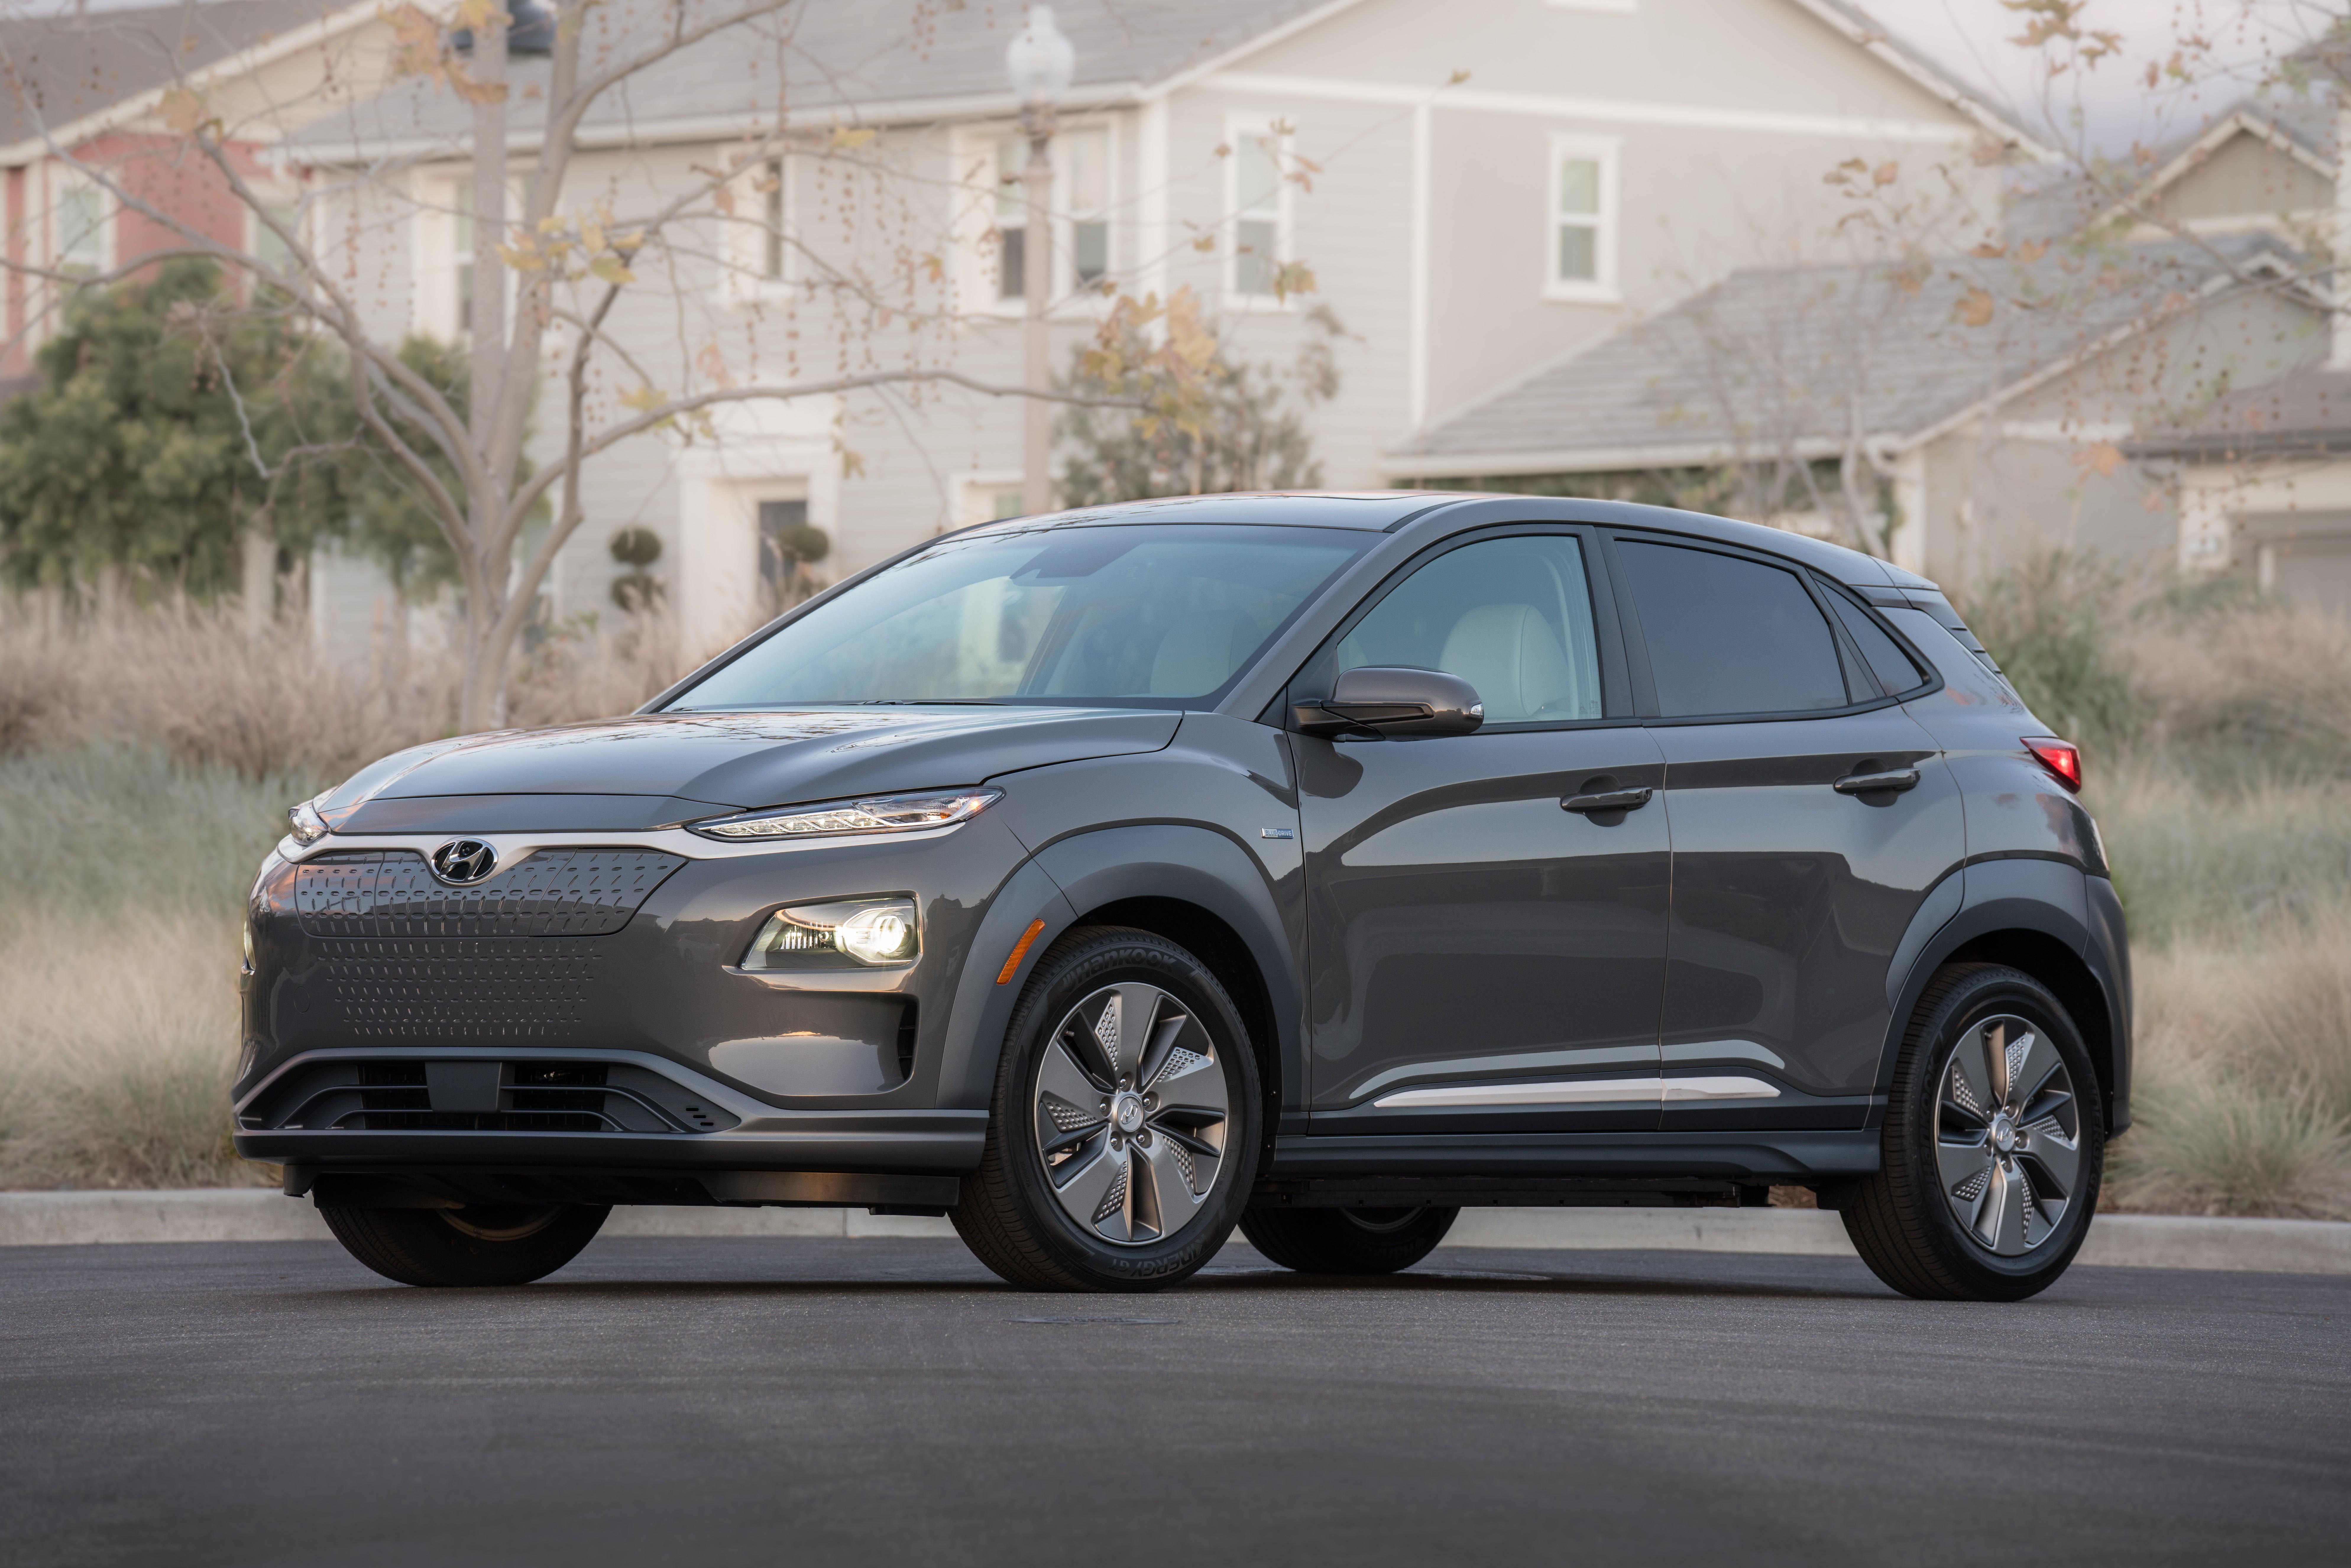 A gray 2019 Hyundai Kona Electric, a compact crossover SUV.